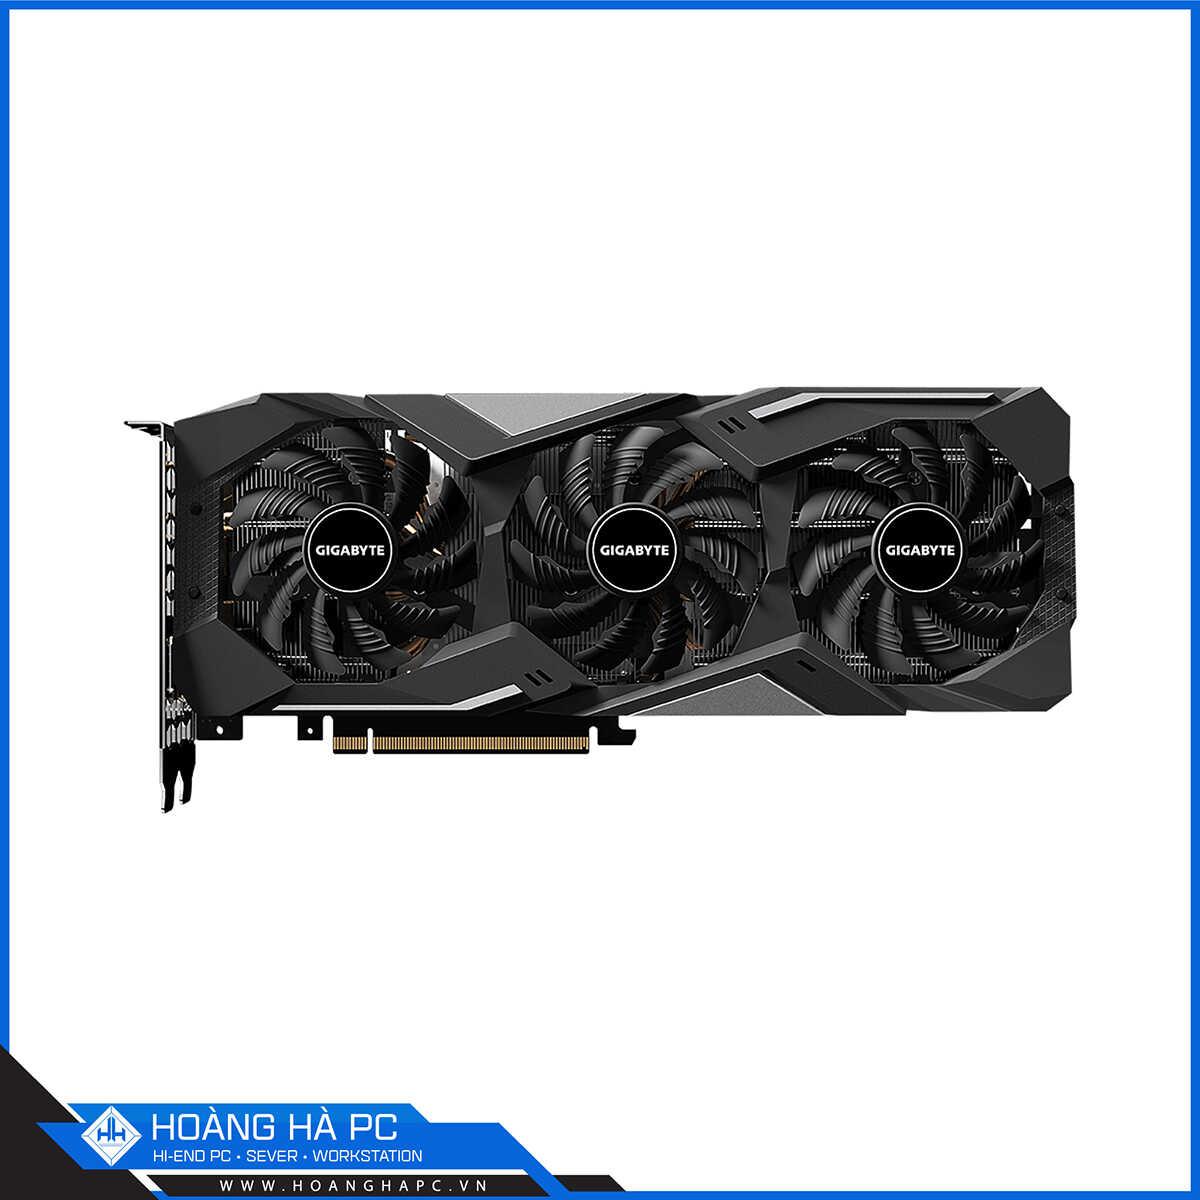 Gigabyte GeForce RTX 2080 Ti WINDFORCE 11G